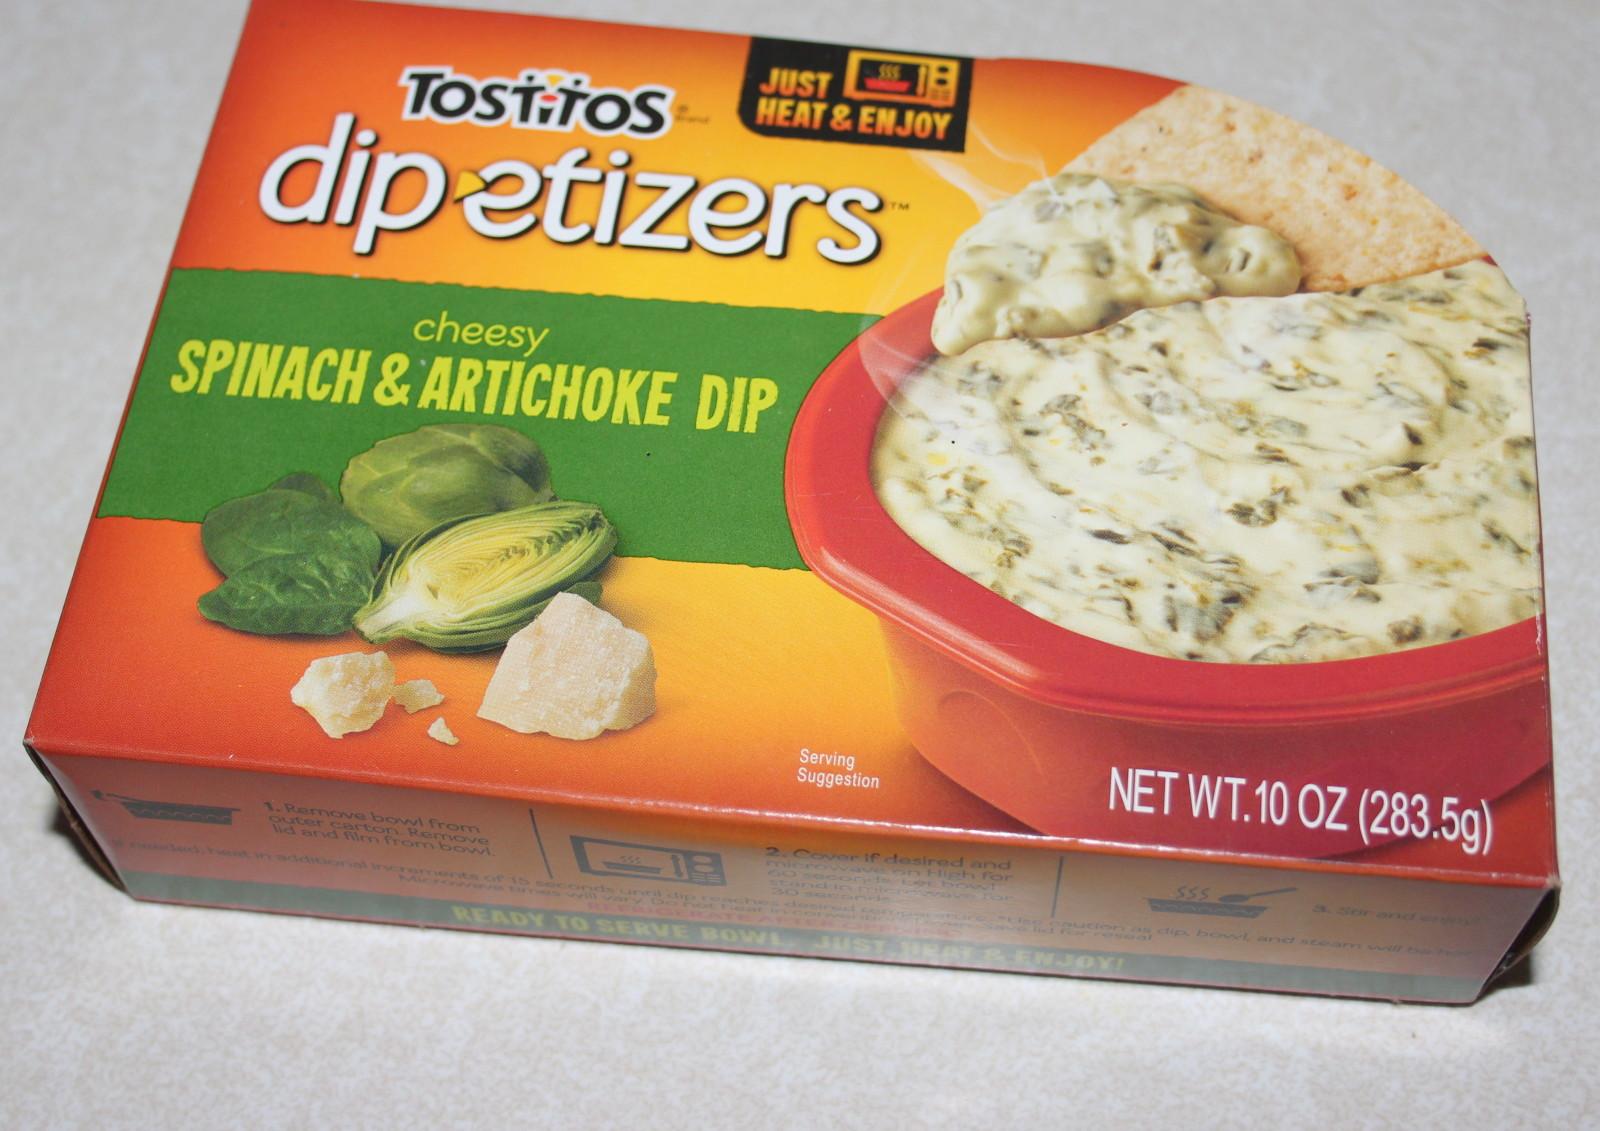 TOSTITOS® DIP-ETIZERS™ Cheesy Spinach & Artichoke Dip